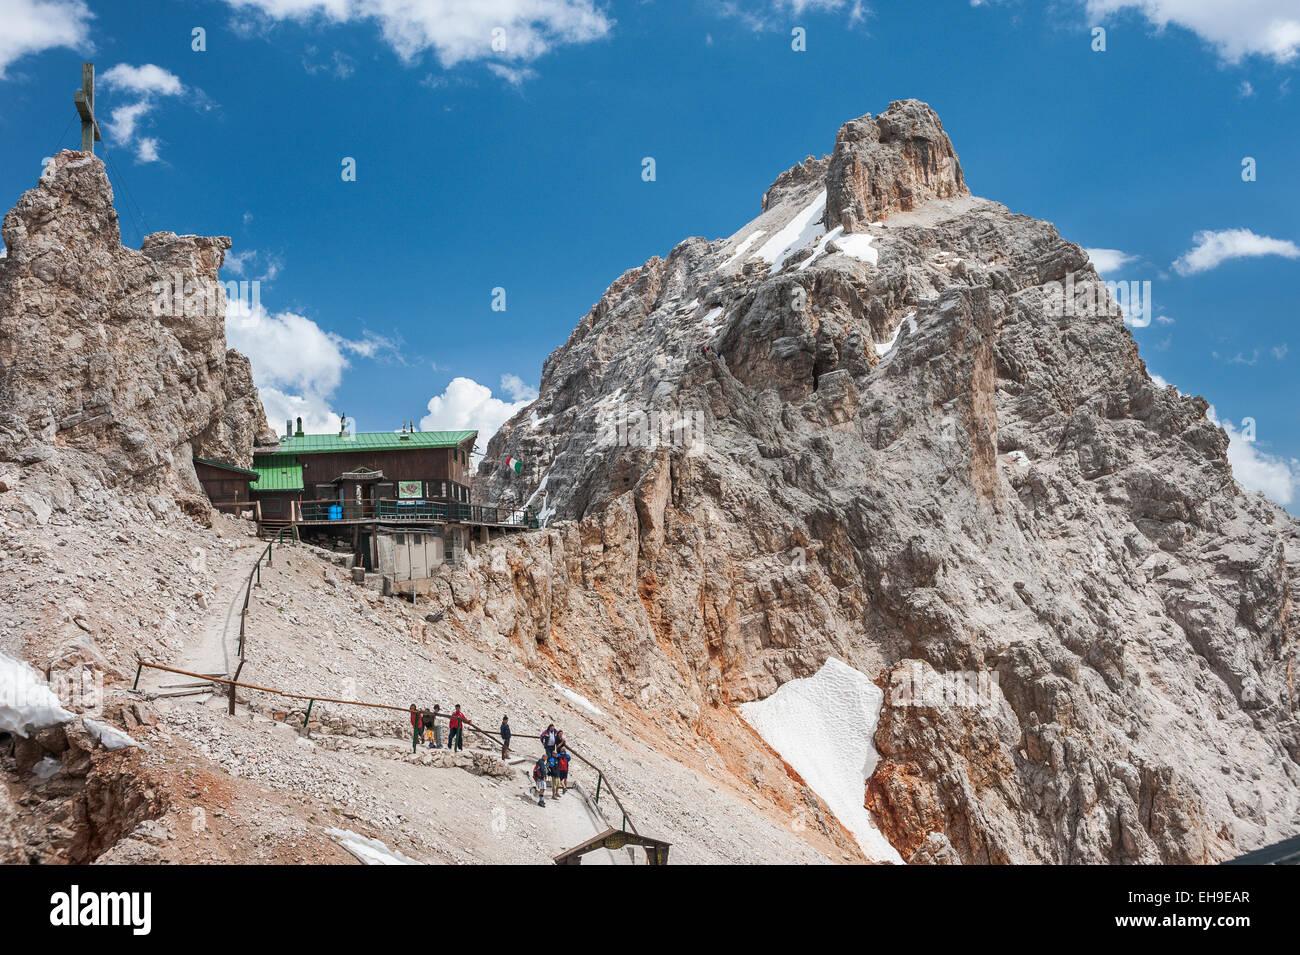 Lorenzihütte refuge, 2932 m, Rifugio Son Forca, at the back the Marino Bianchi Via Ferrata, Cristallo group, - Stock Image